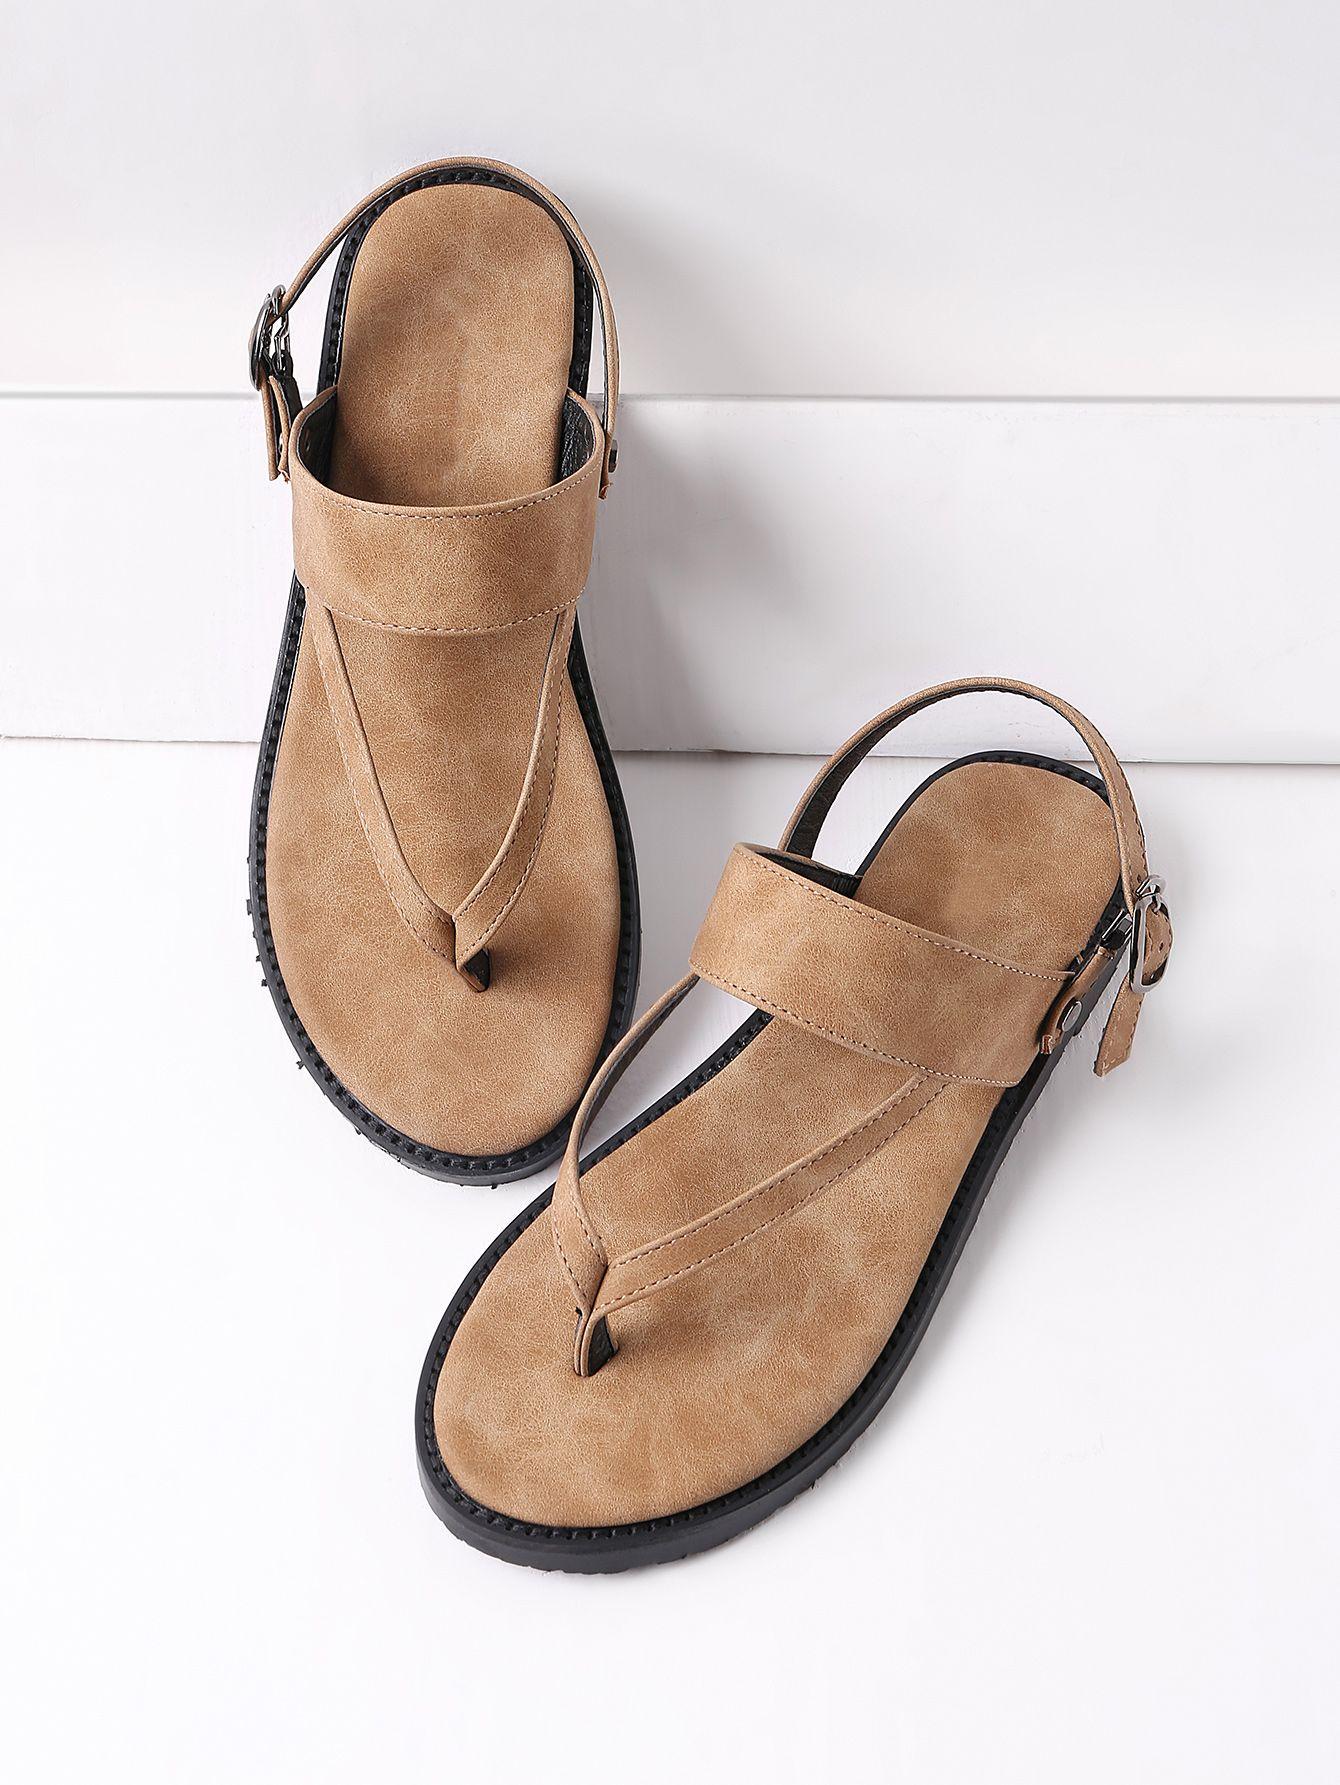 Shoes flats sandals